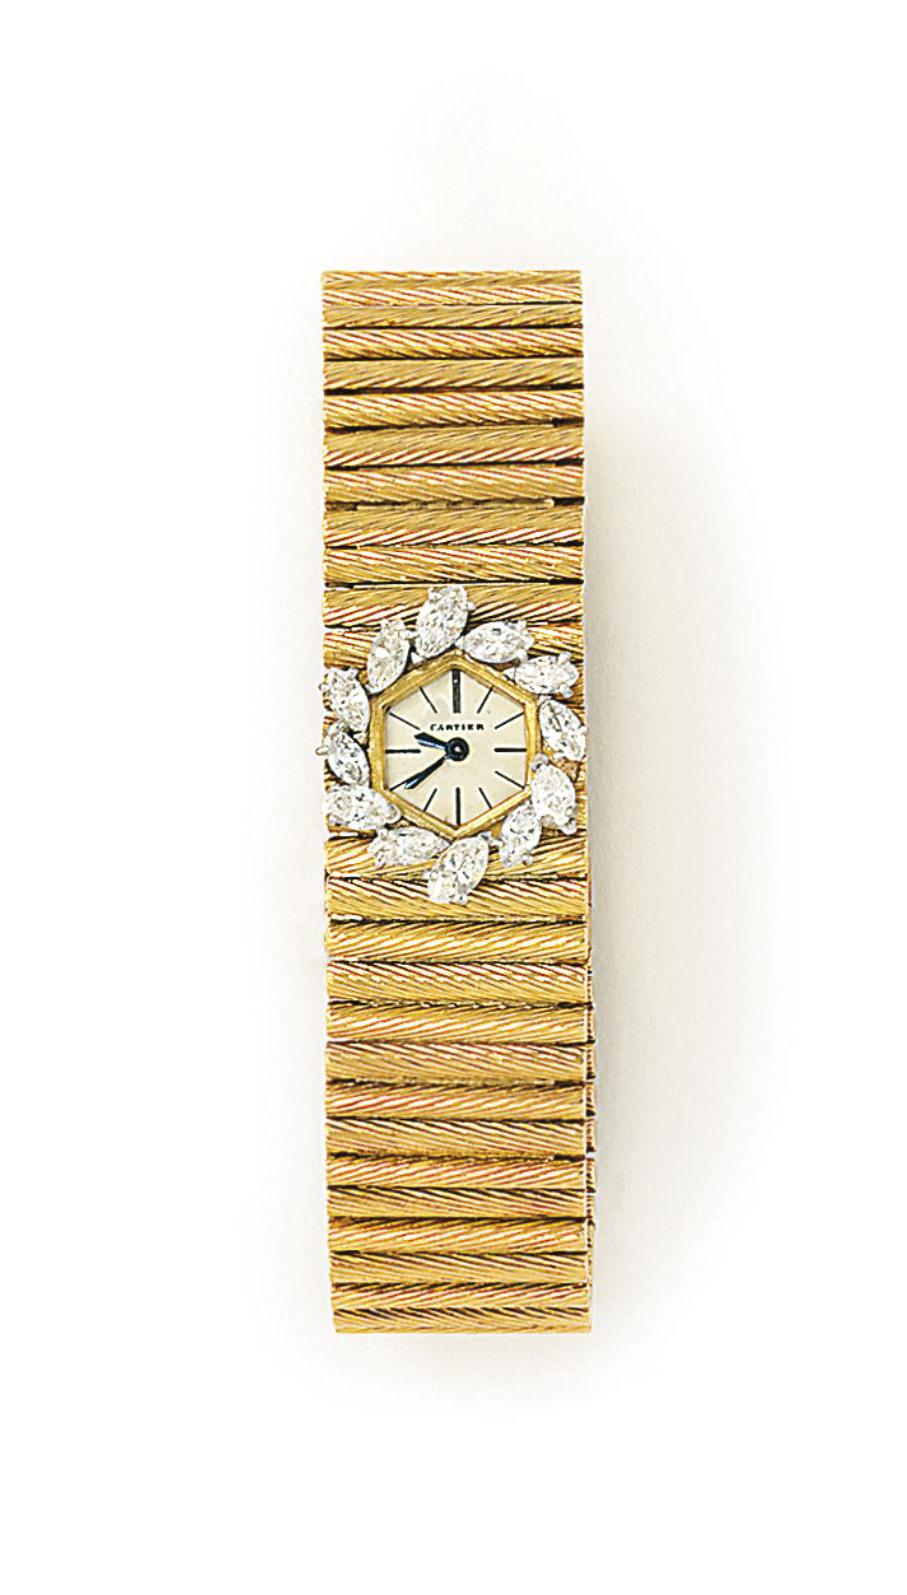 A LADY'S DIAMOND-SET WRISTWATC